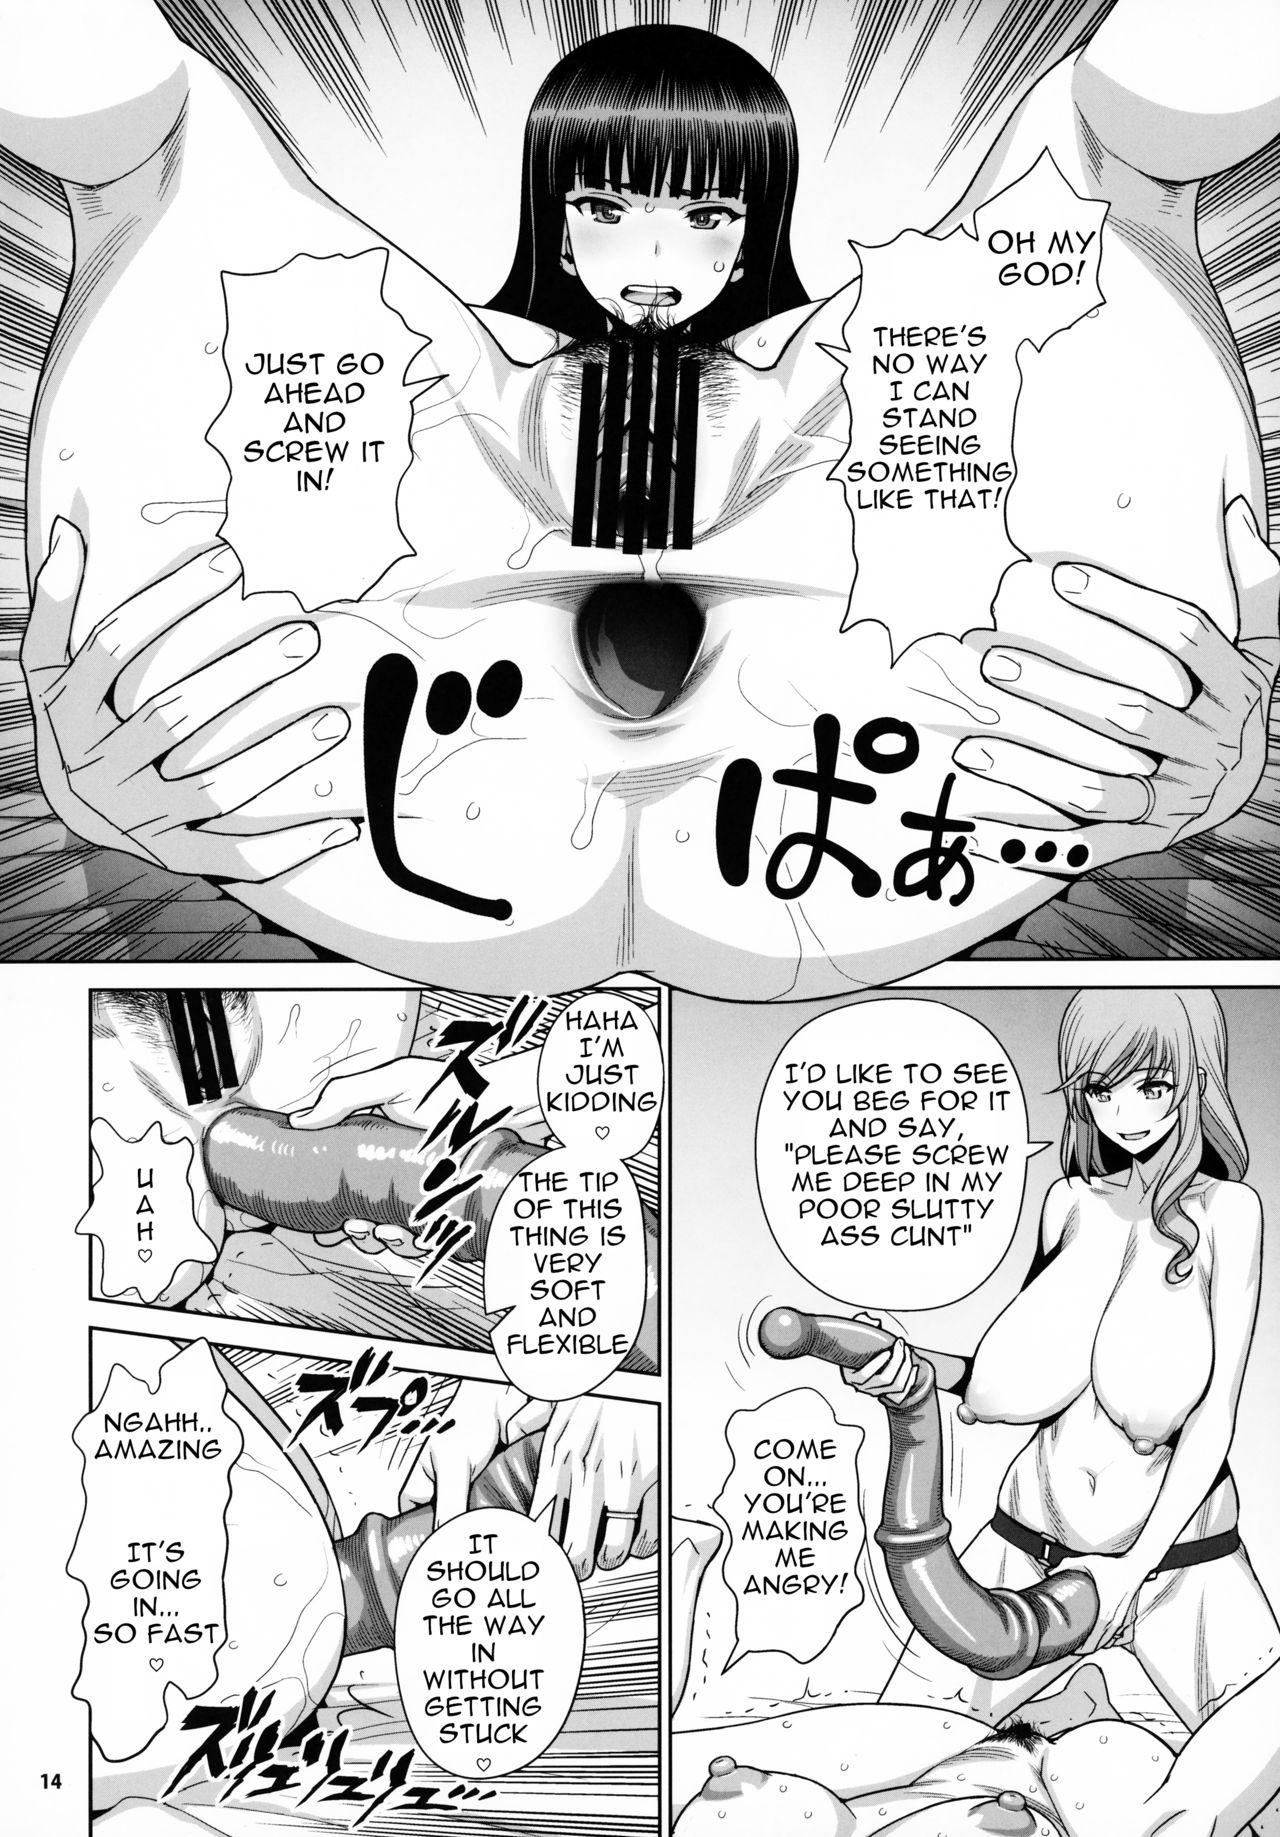 (COMIC1☆15) [Gerupin (Minazuki Juuzou, USSO)] Shimada-ryuu VS Nishizumi-ryuu Bijukujo Lesbian Kyokugen Kougyaku Gurui | Shimada Style VS Nishizumi Style MILF Lesbian Extreme Anal Fetish (Girls und Panzer) [English] 12